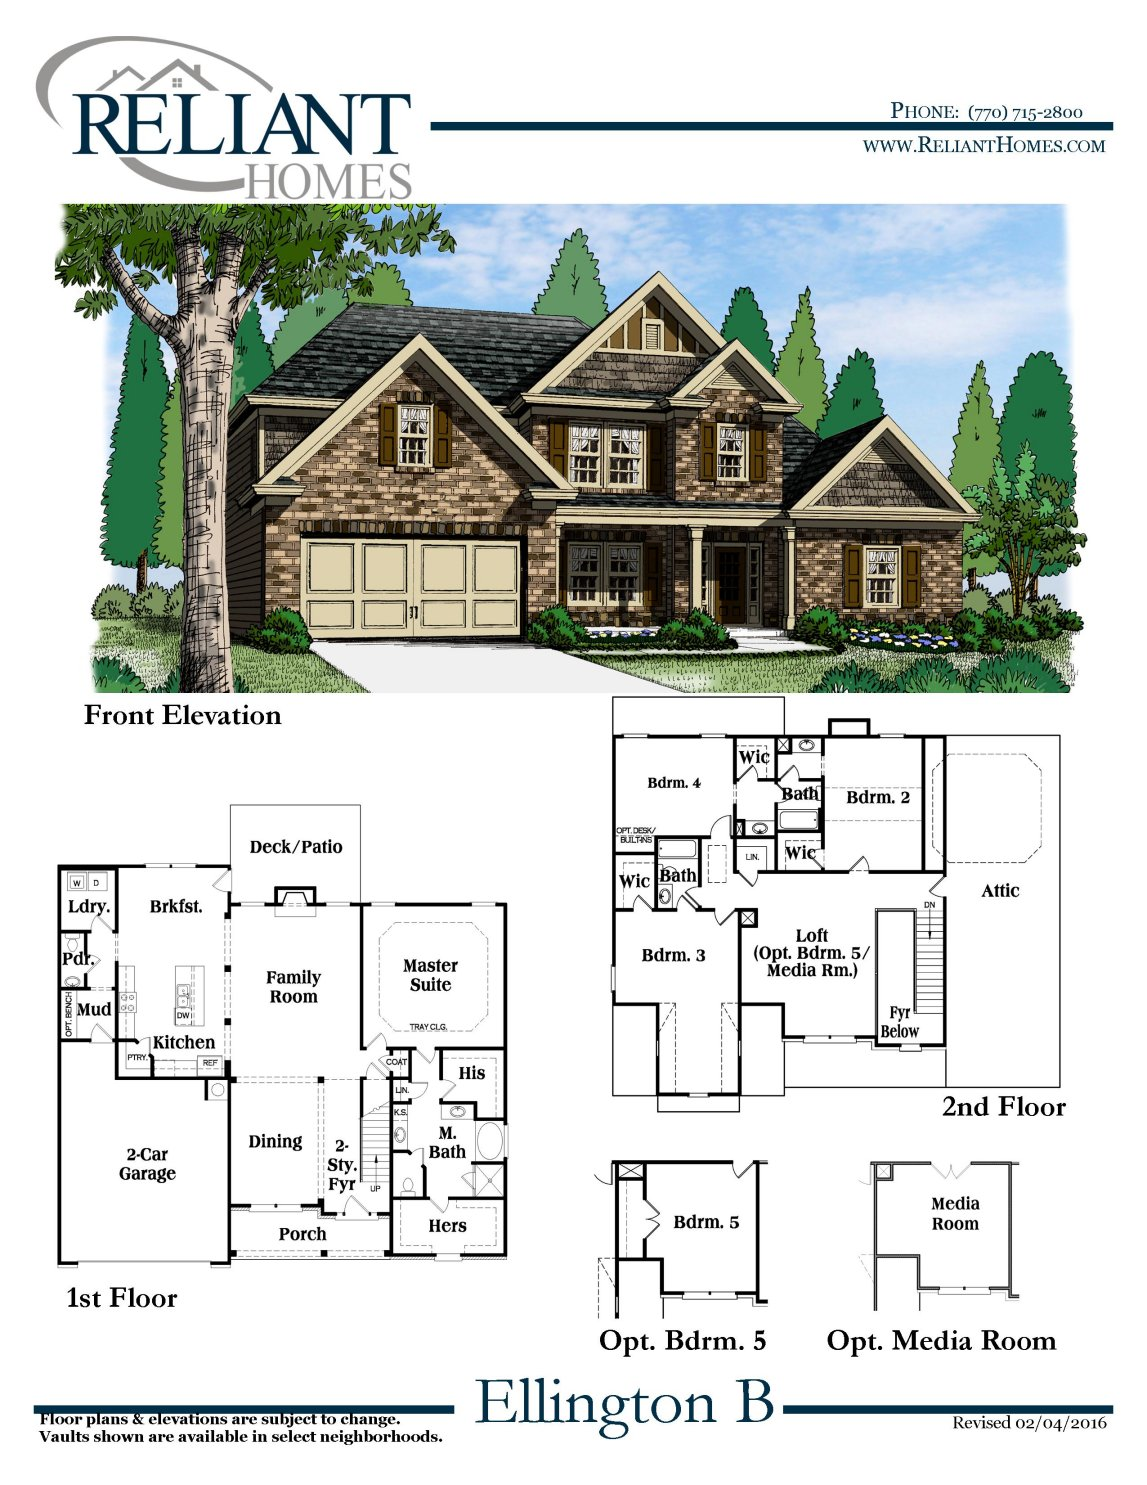 Ellington b fe reliant homes new homes in atlanta for Reliant homes floor plans